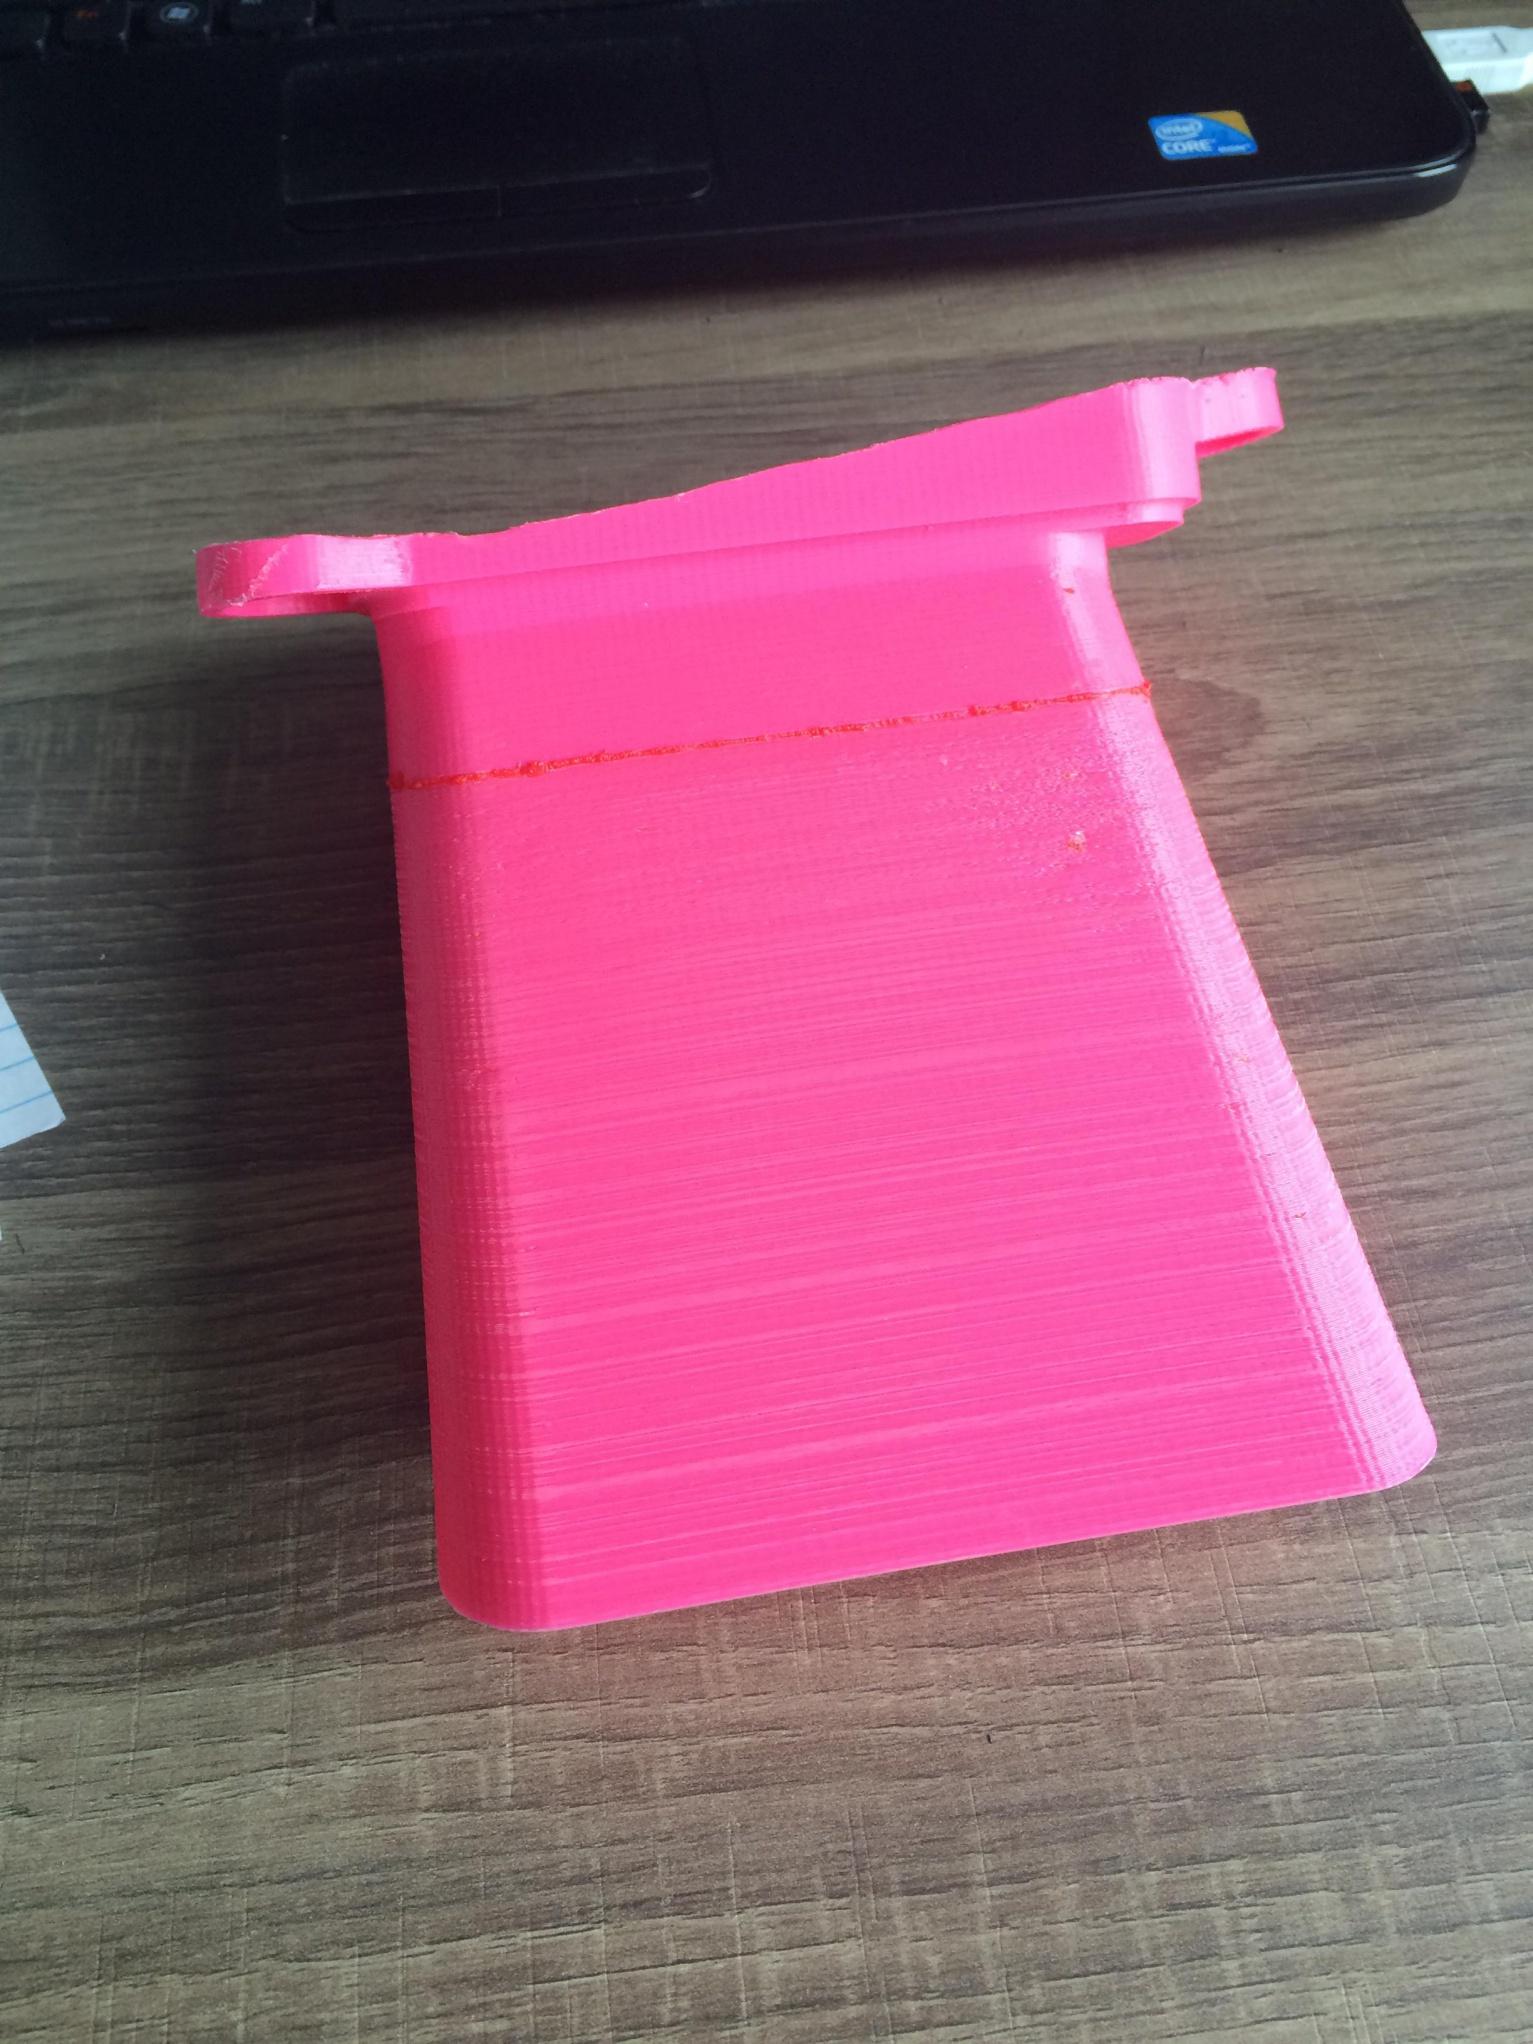 3D printer on standby (snorkel)-img_2978_1497898991801.jpg